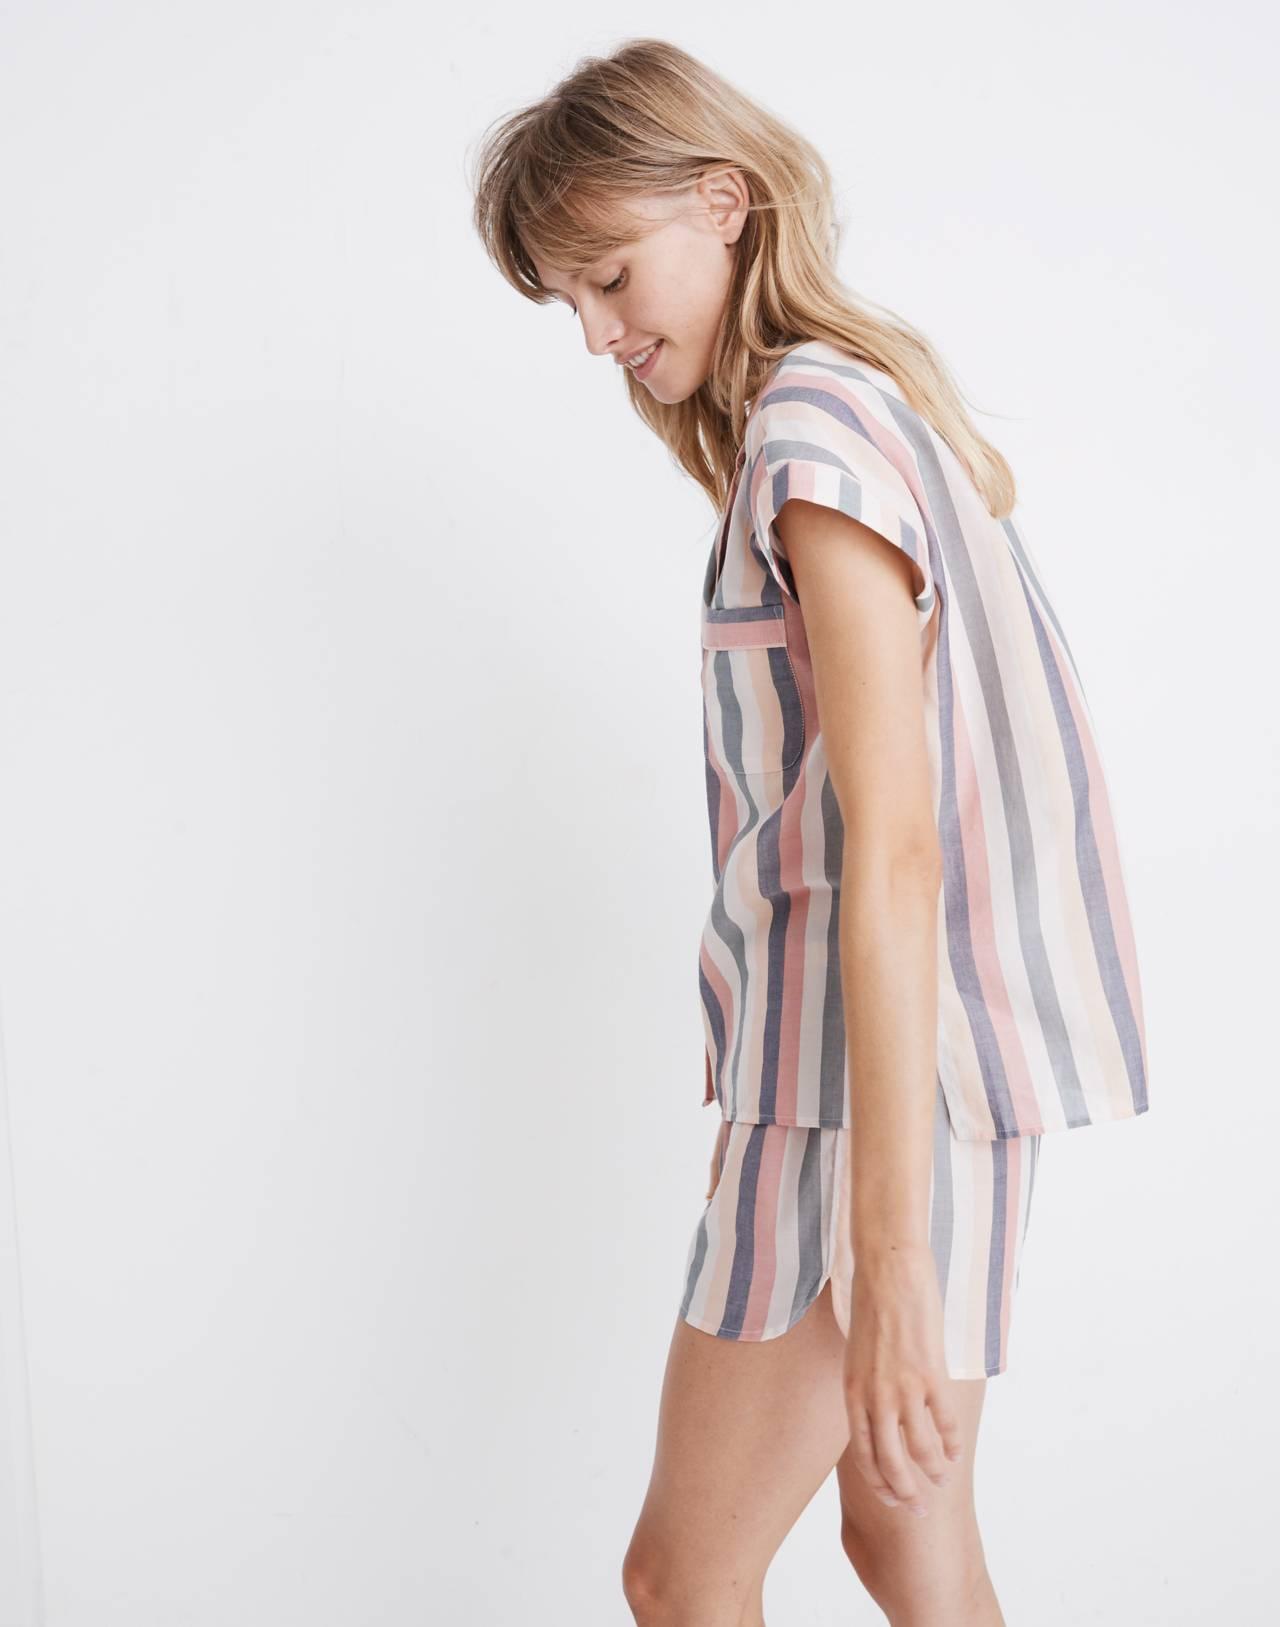 Flannel Bedtime Pajama Top in Lonnie Stripe in sweet dahlia jessie stripe image 2